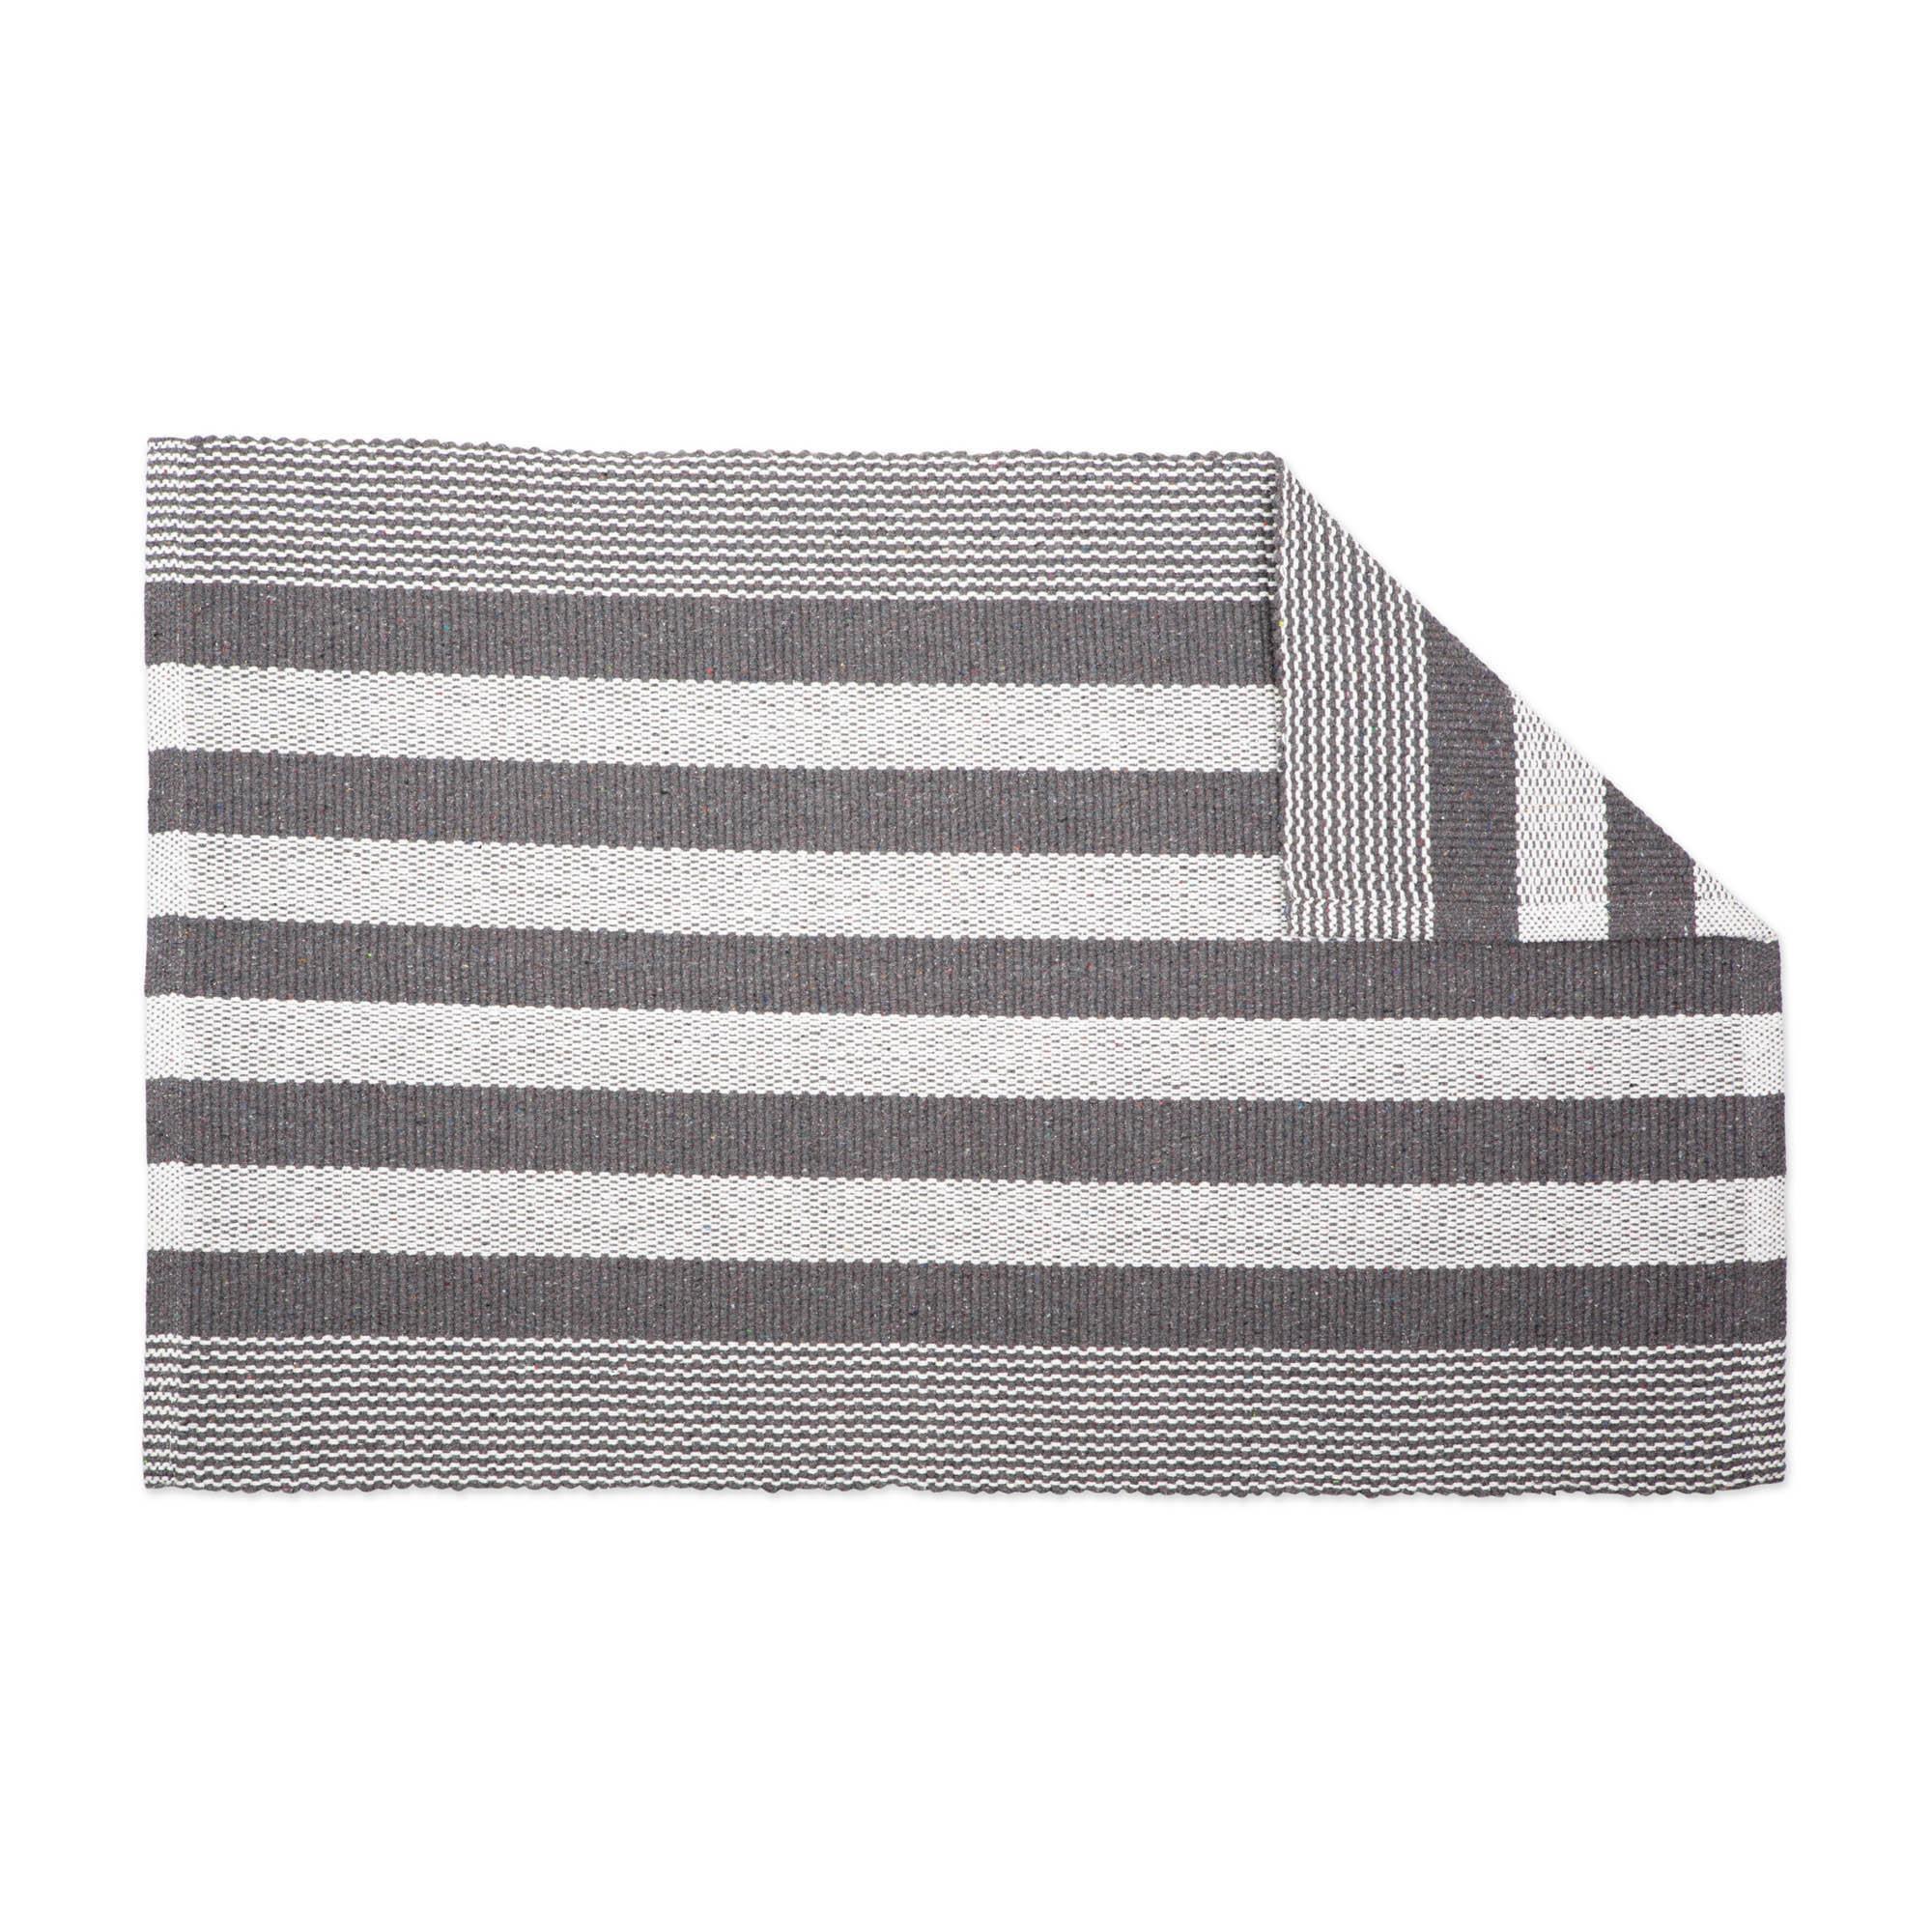 Tuscola Recycled Yarn Cabana Stripe